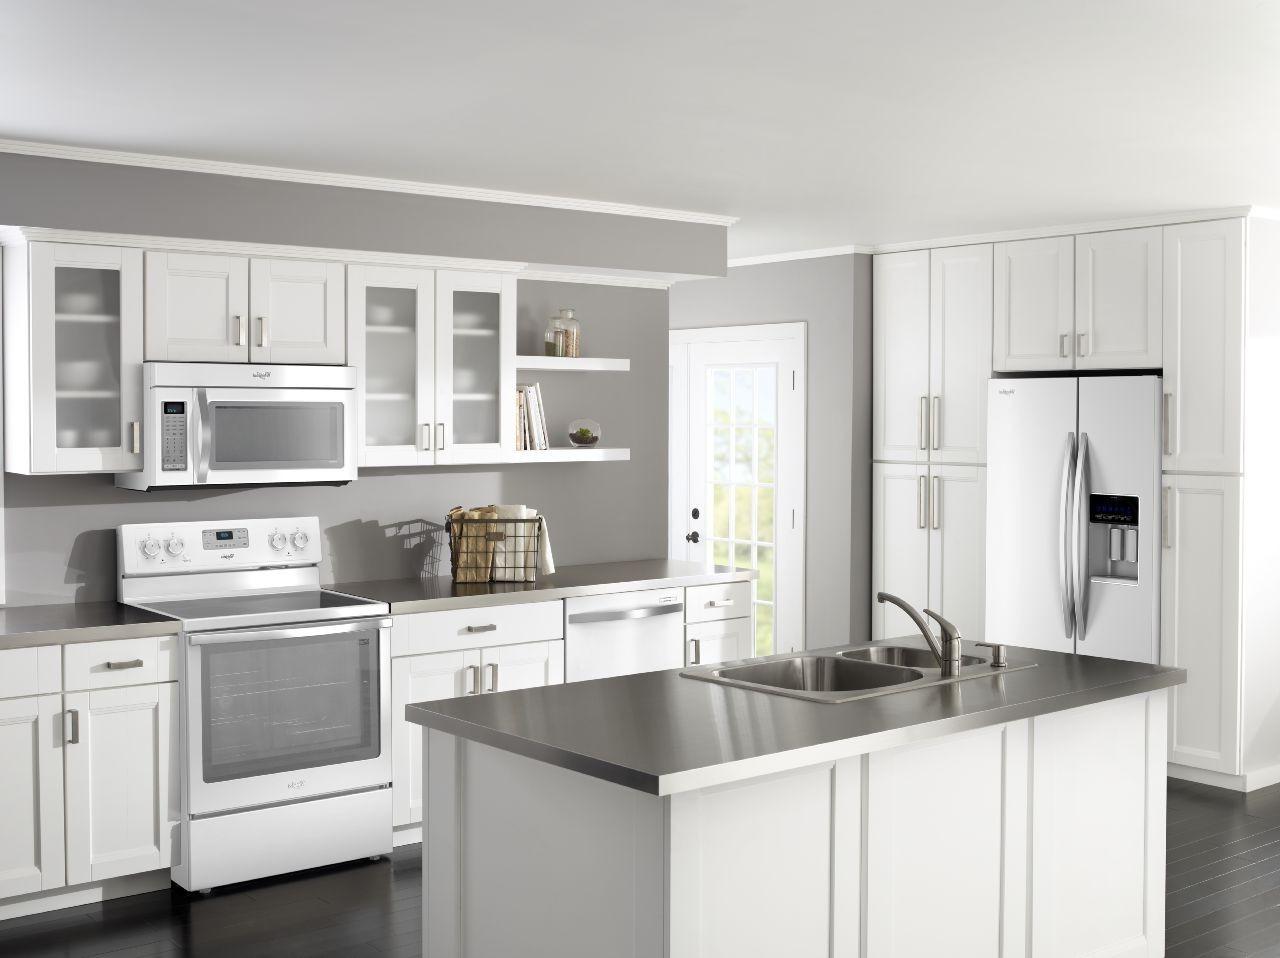 Kitchen Cabinet Ideas With White Appliances Hawk Haven